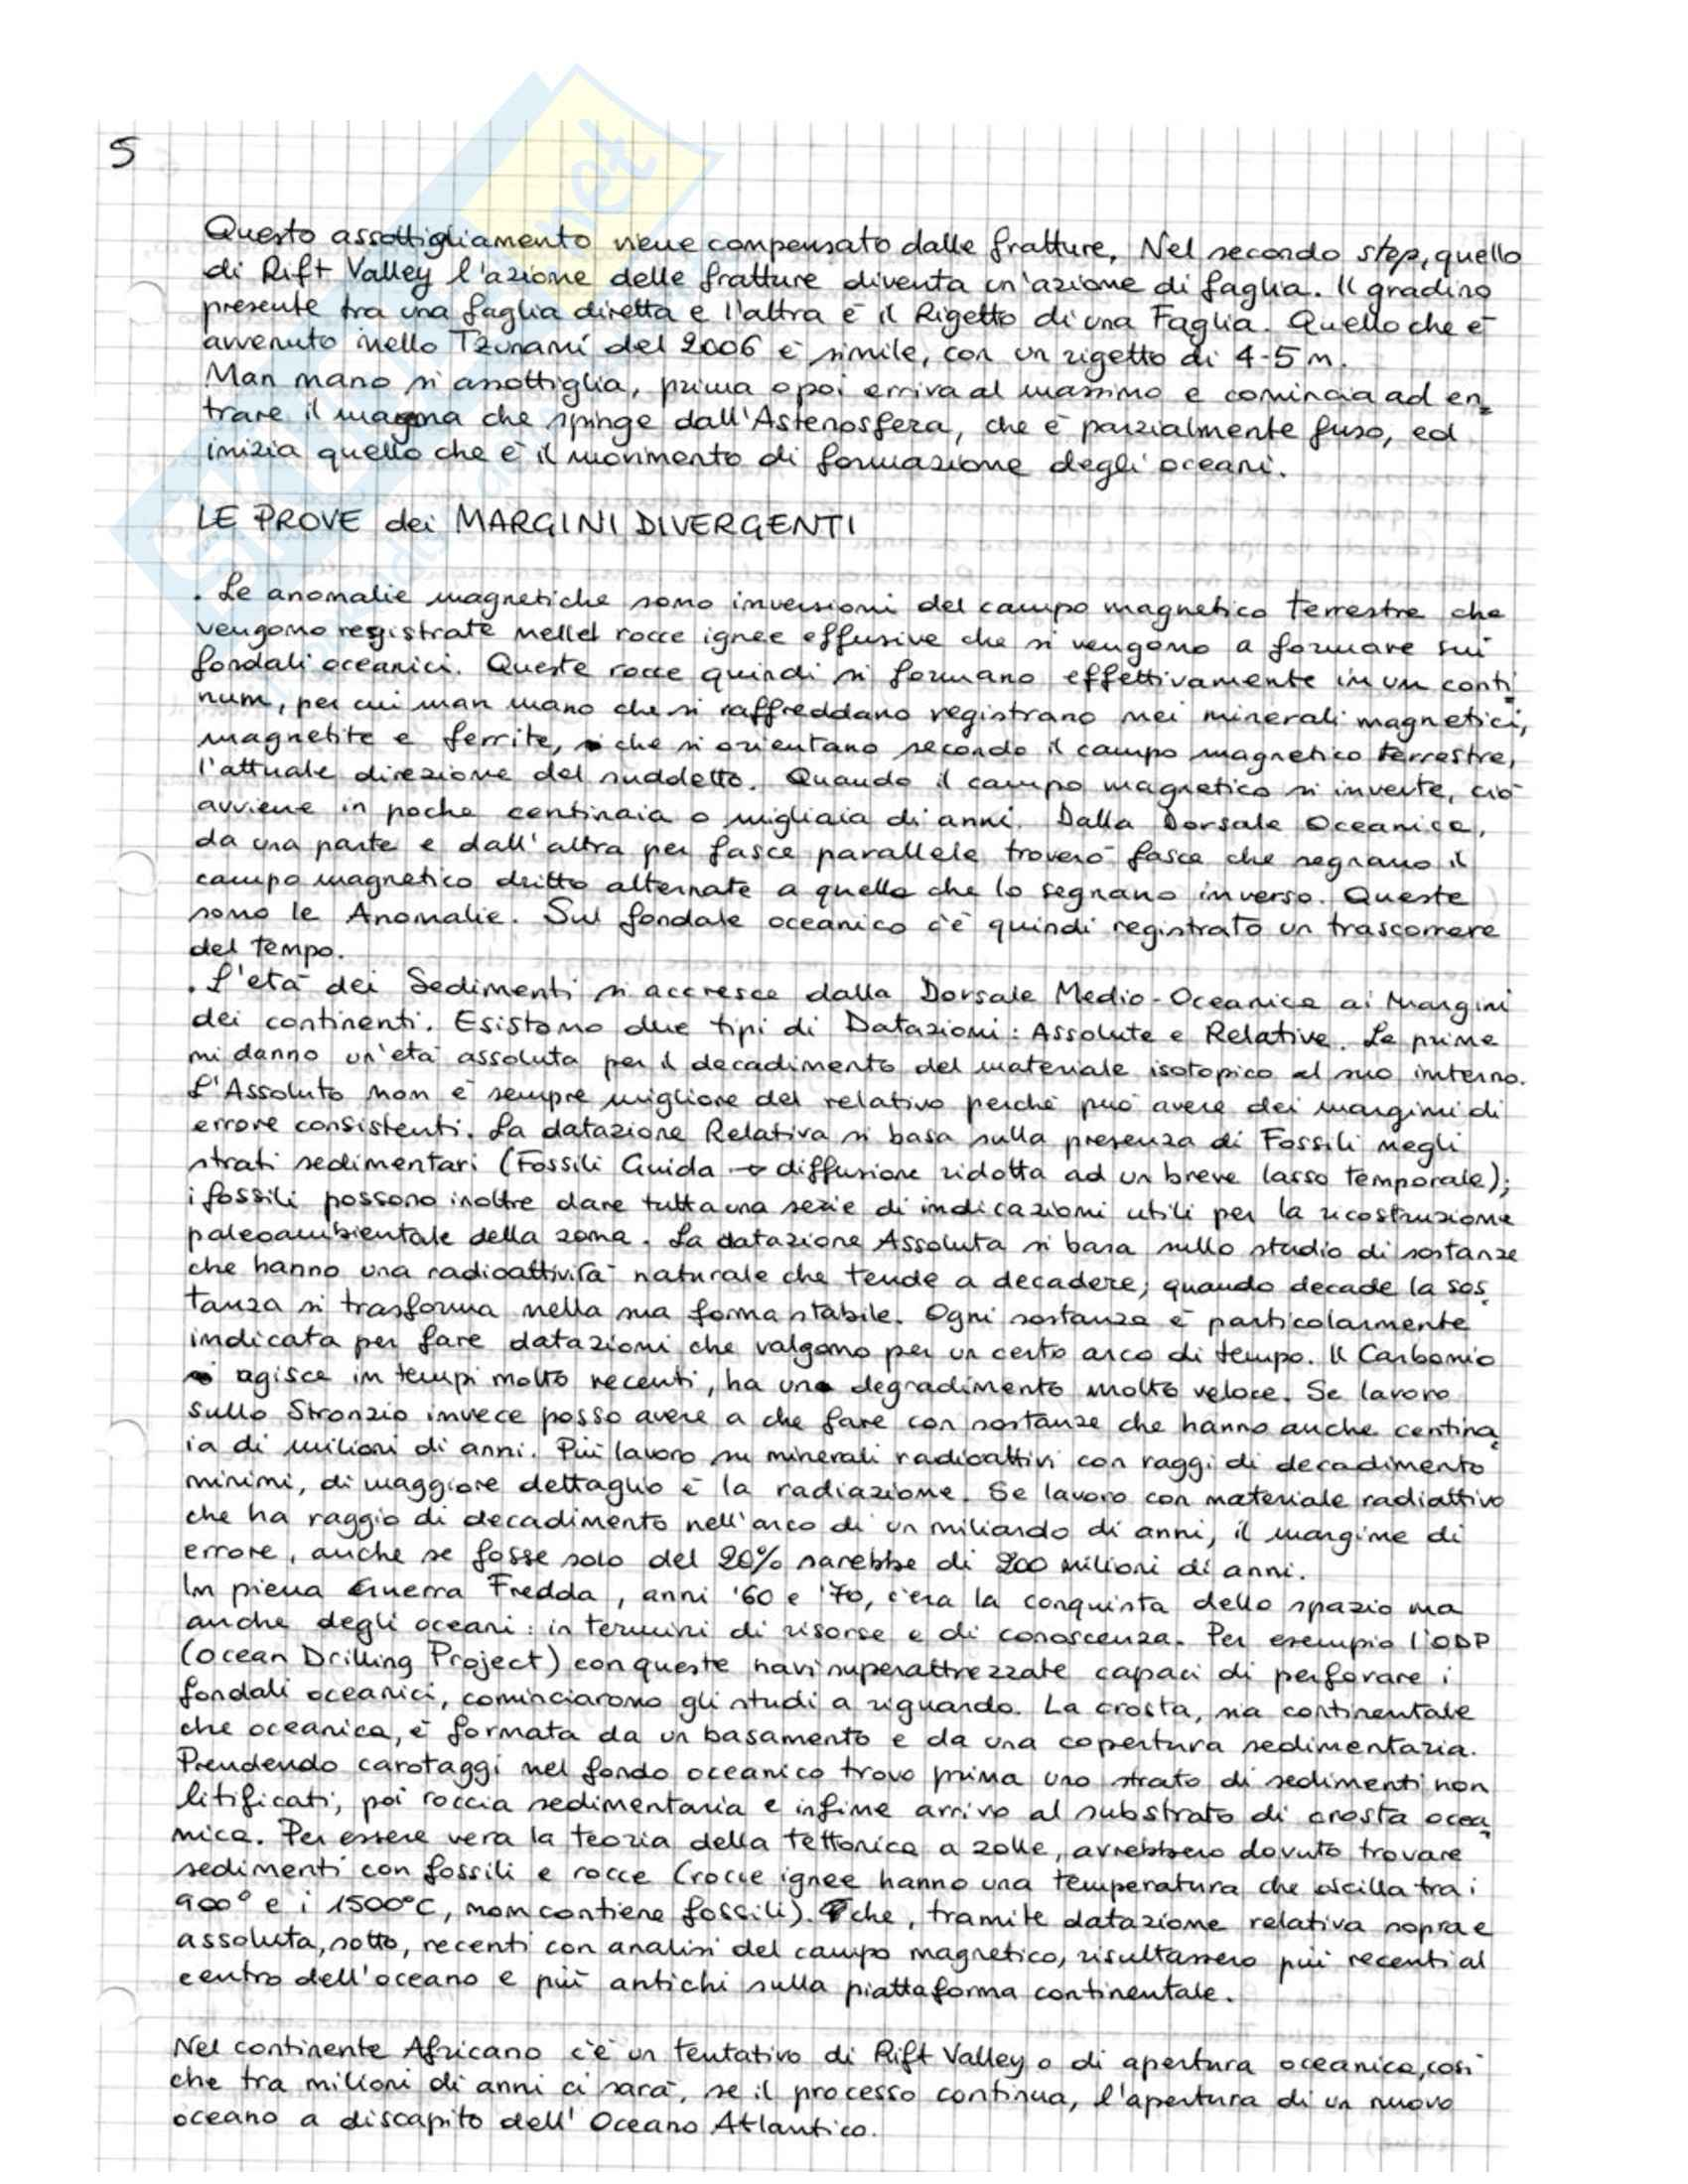 Geologia Ambientale - Appunti Pag. 6